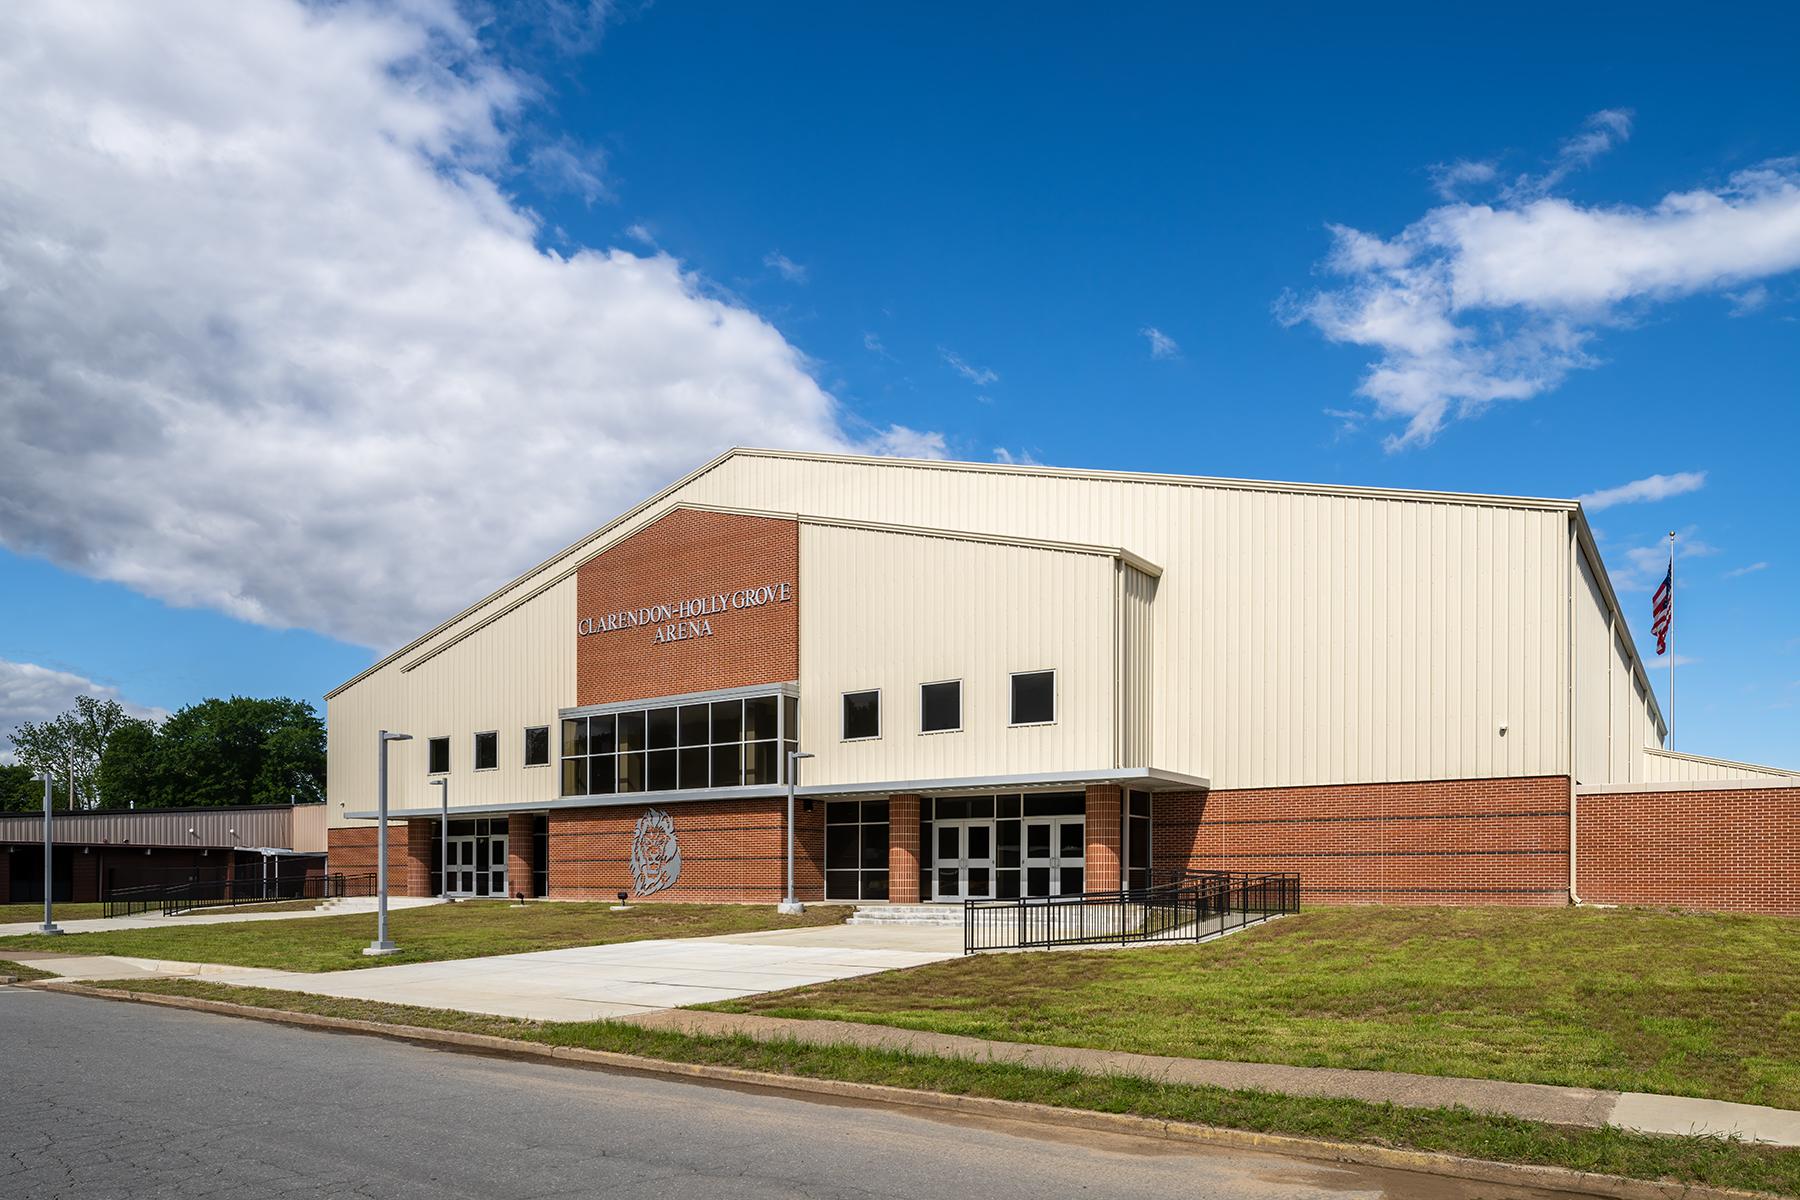 Clarendon-Holly Grove School District Arena – Exterior